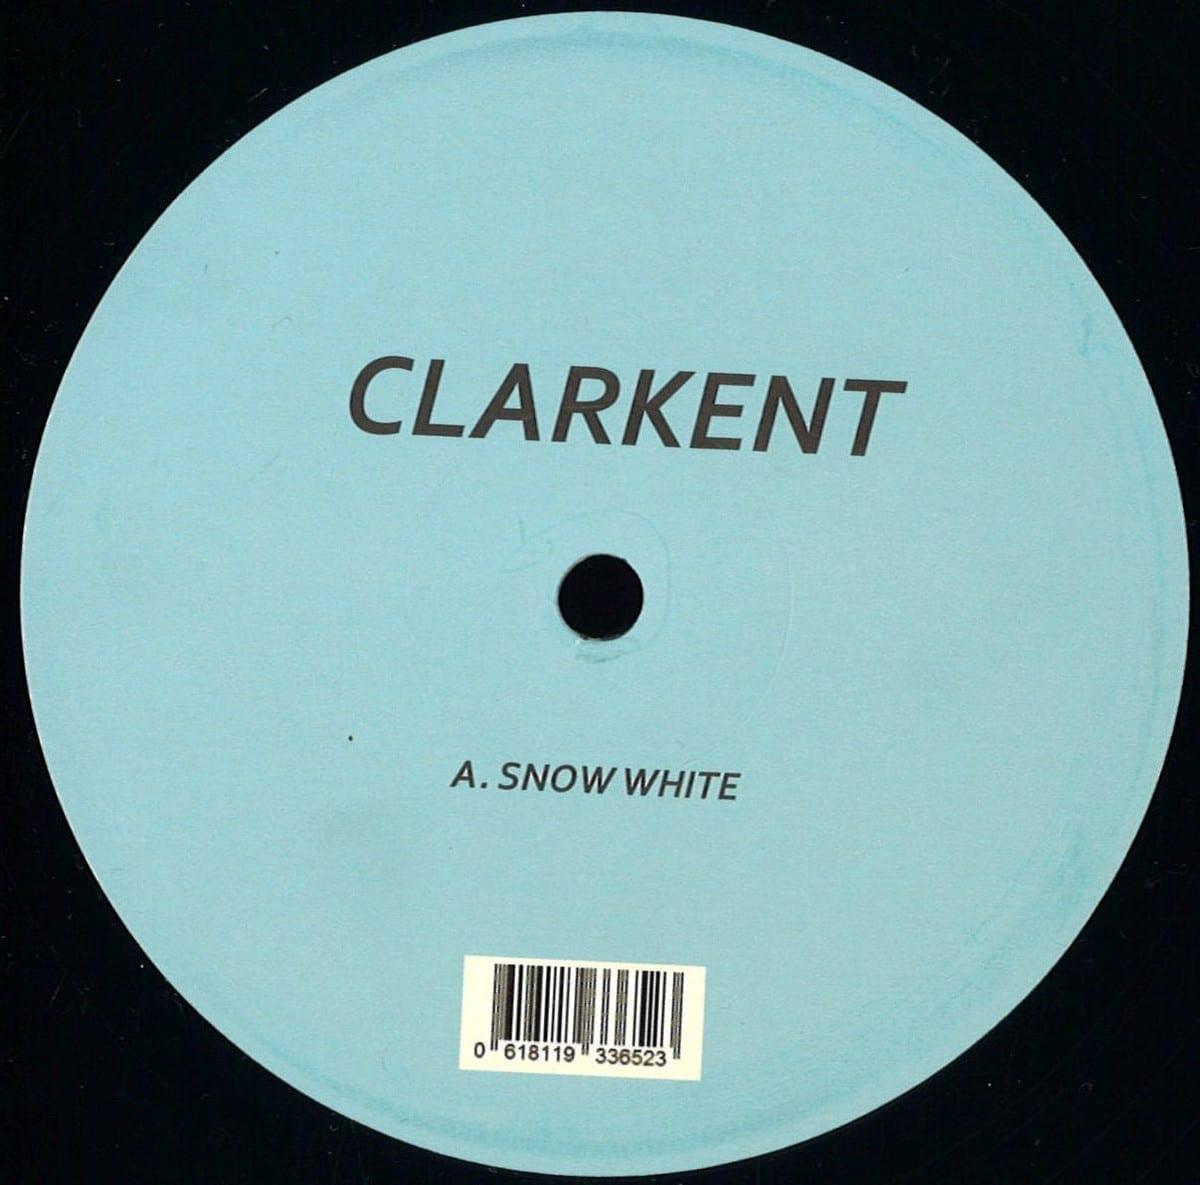 clarkent snow white